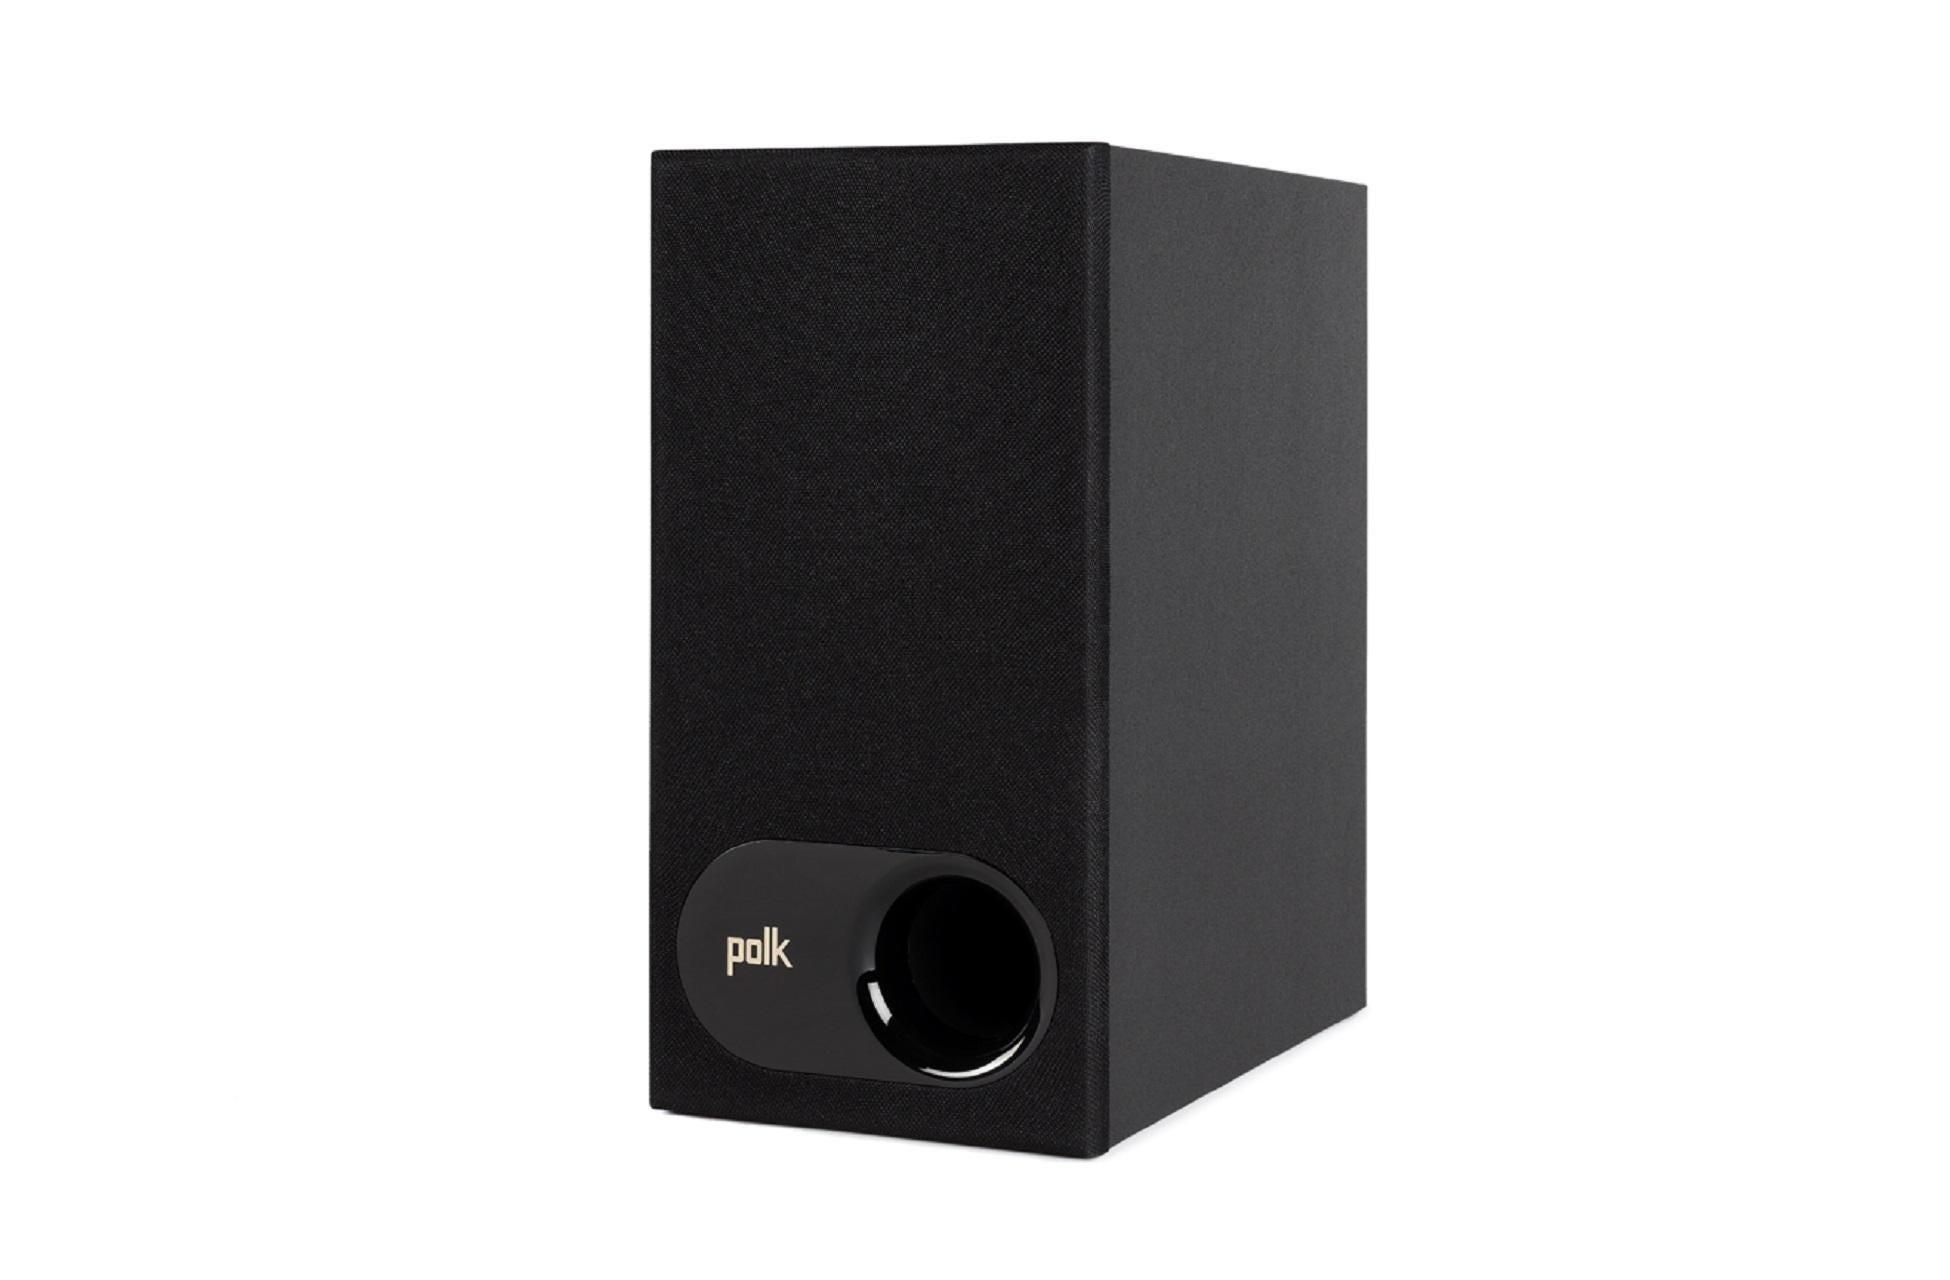 Polk Signa S2 soundbar